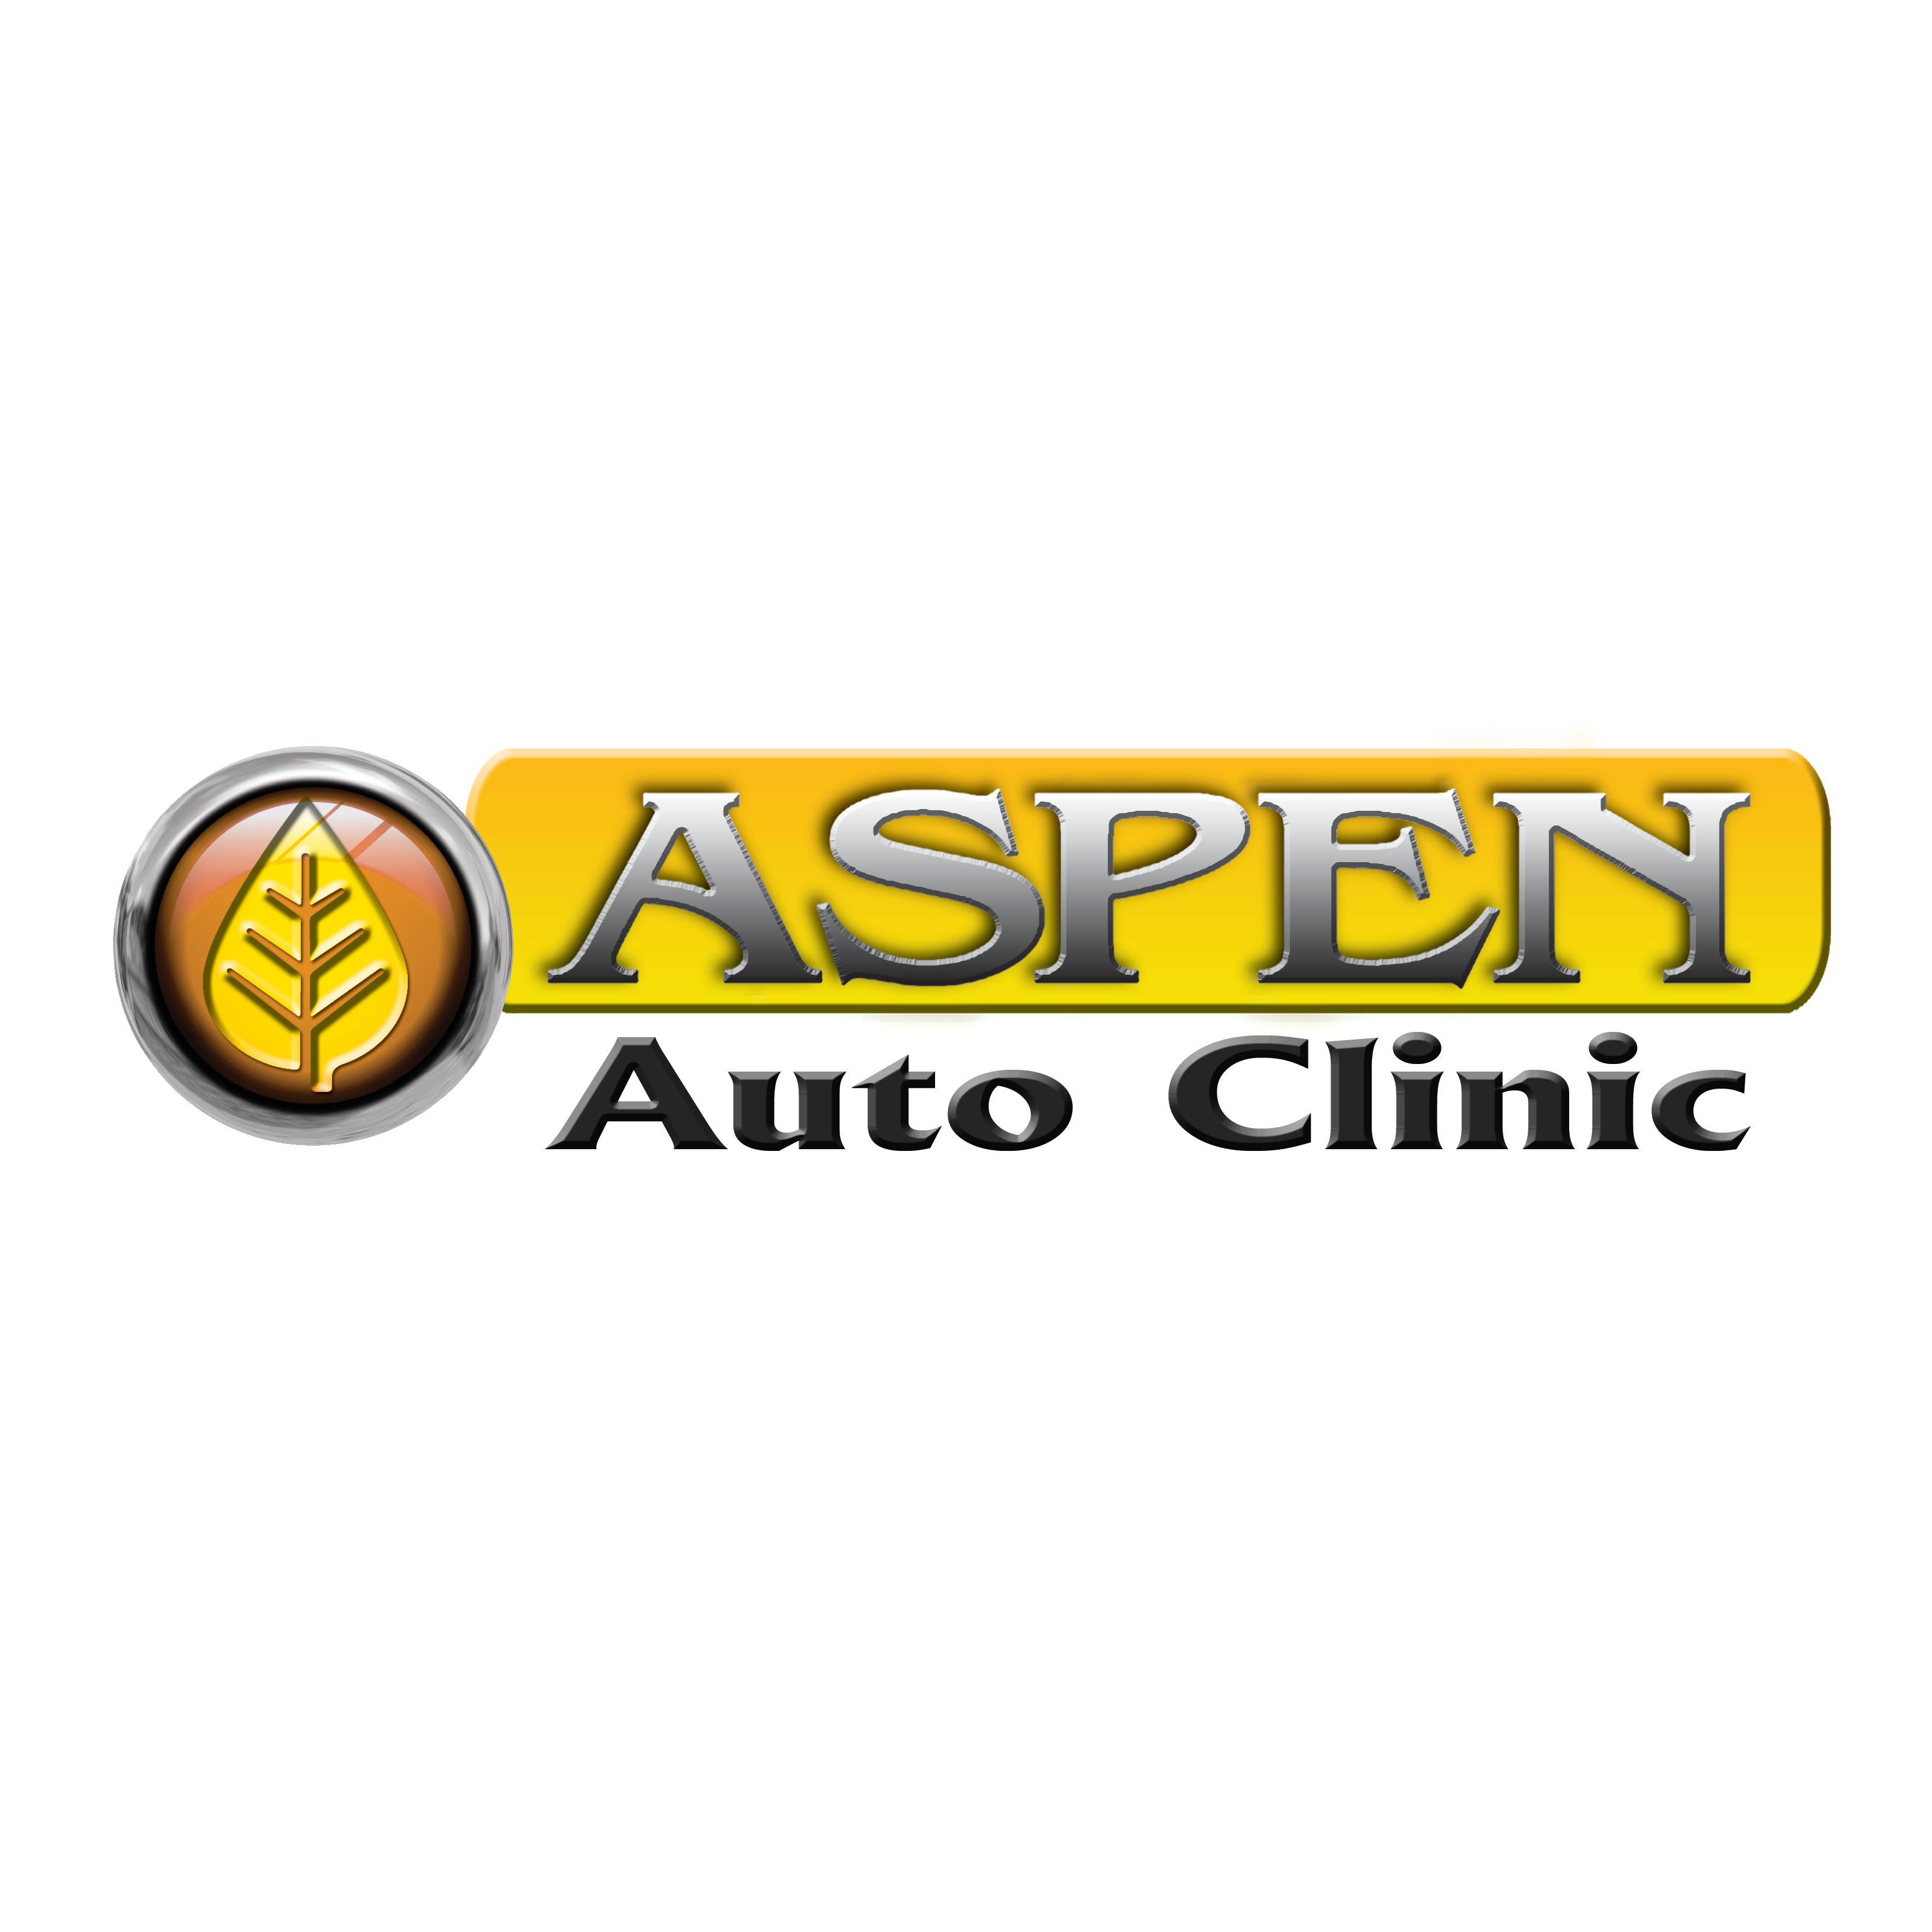 Aspen Auto Clinic - Englewood, CO 80112 - (303)800-7020   ShowMeLocal.com